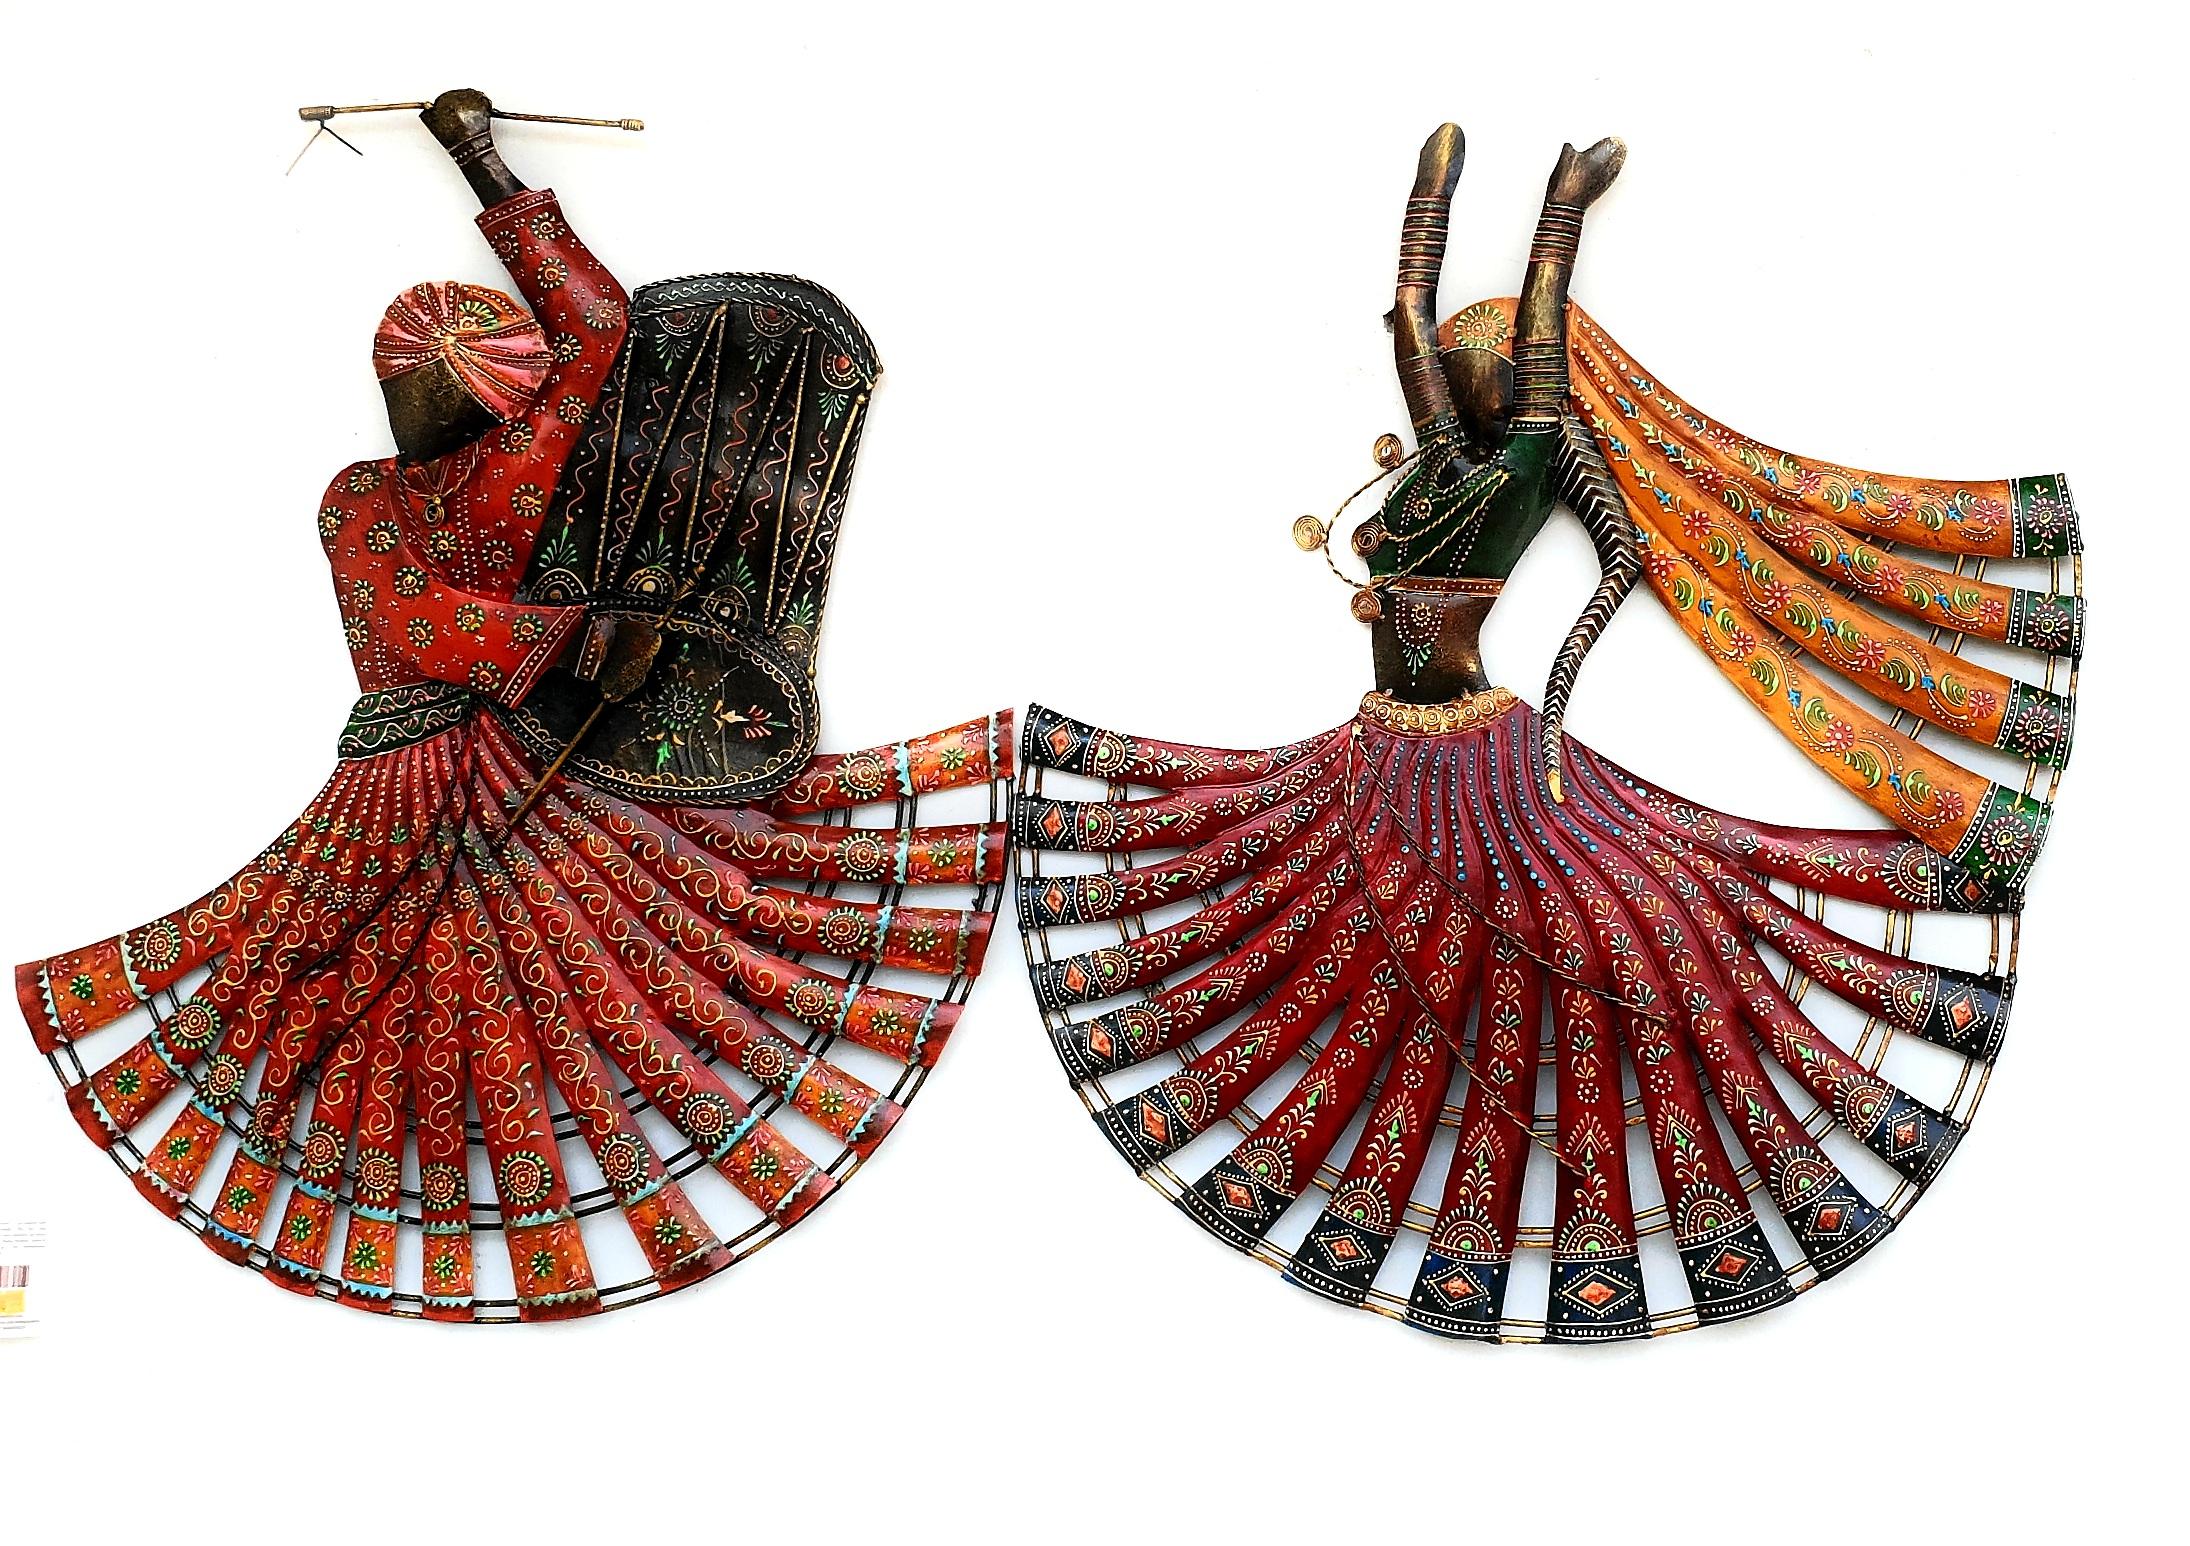 Metal Handicraft Rajasthan Lahriya Dancing Wall Decor Metal Art Buy Indian Handicrafts Online I Handicrafts Of India